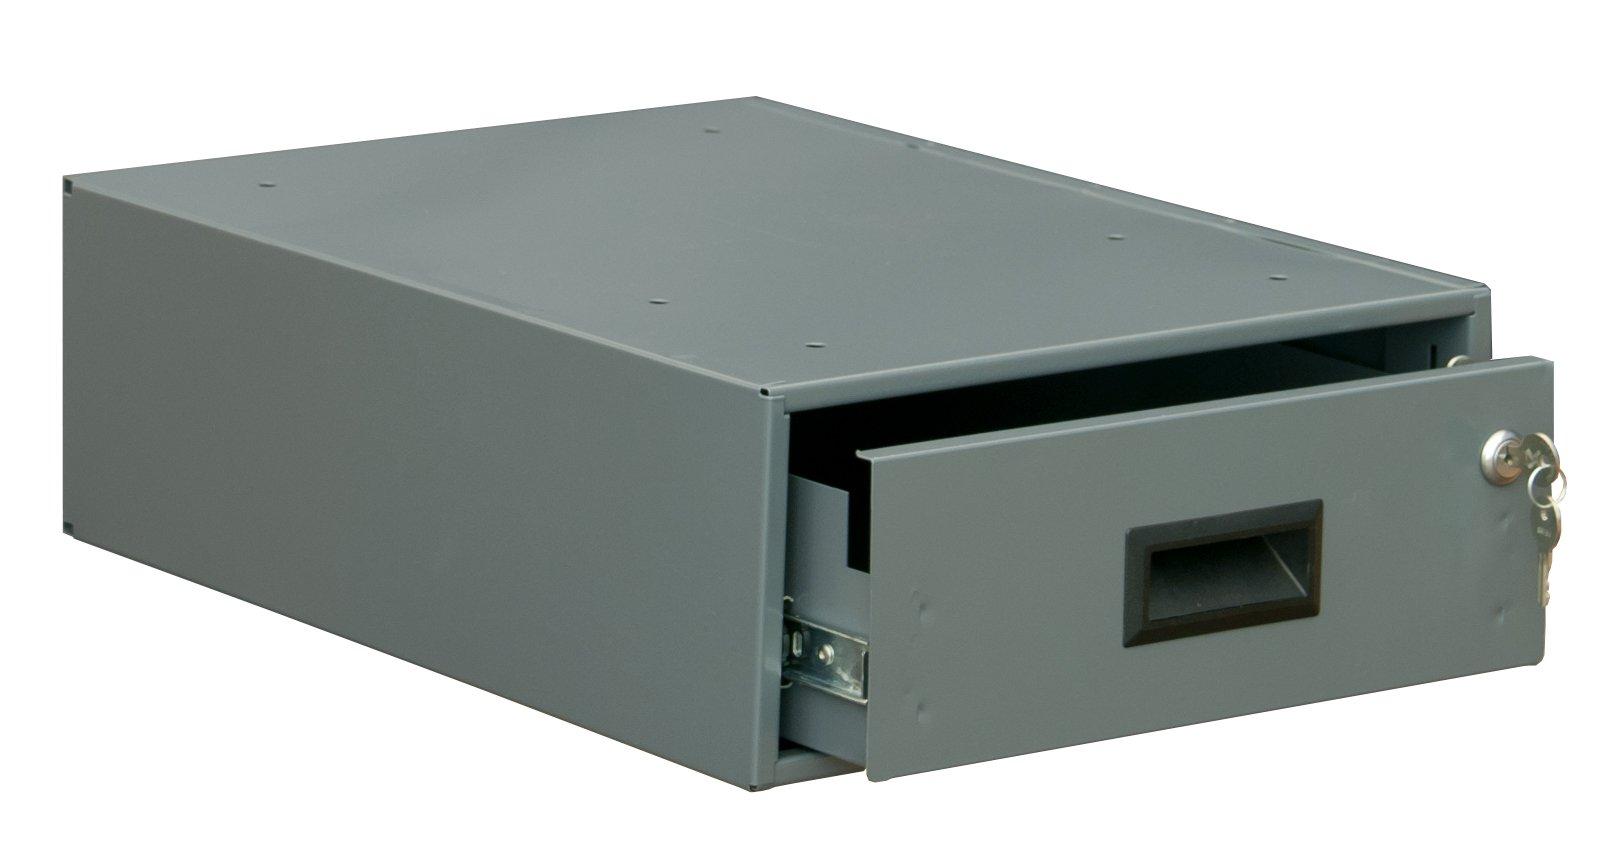 Durham 177-DRAWER-95 Gray Steel Optional Workbench Drawer, 12-1/2'' Width x 4-3/4'' Height x 18-1/2'' Depth